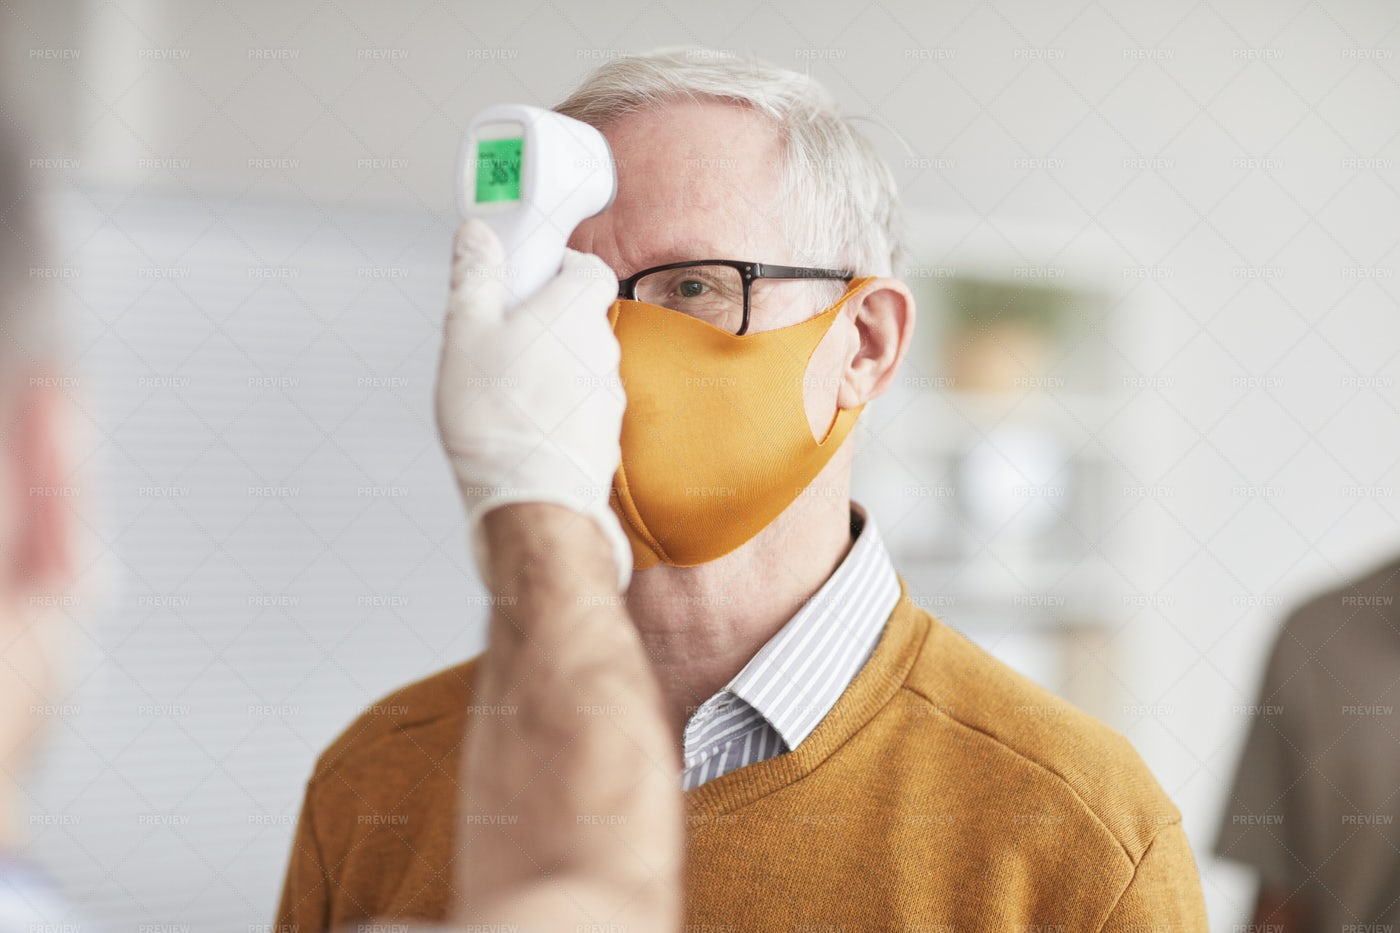 Senior Man At Safety Check In Clinic: Stock Photos